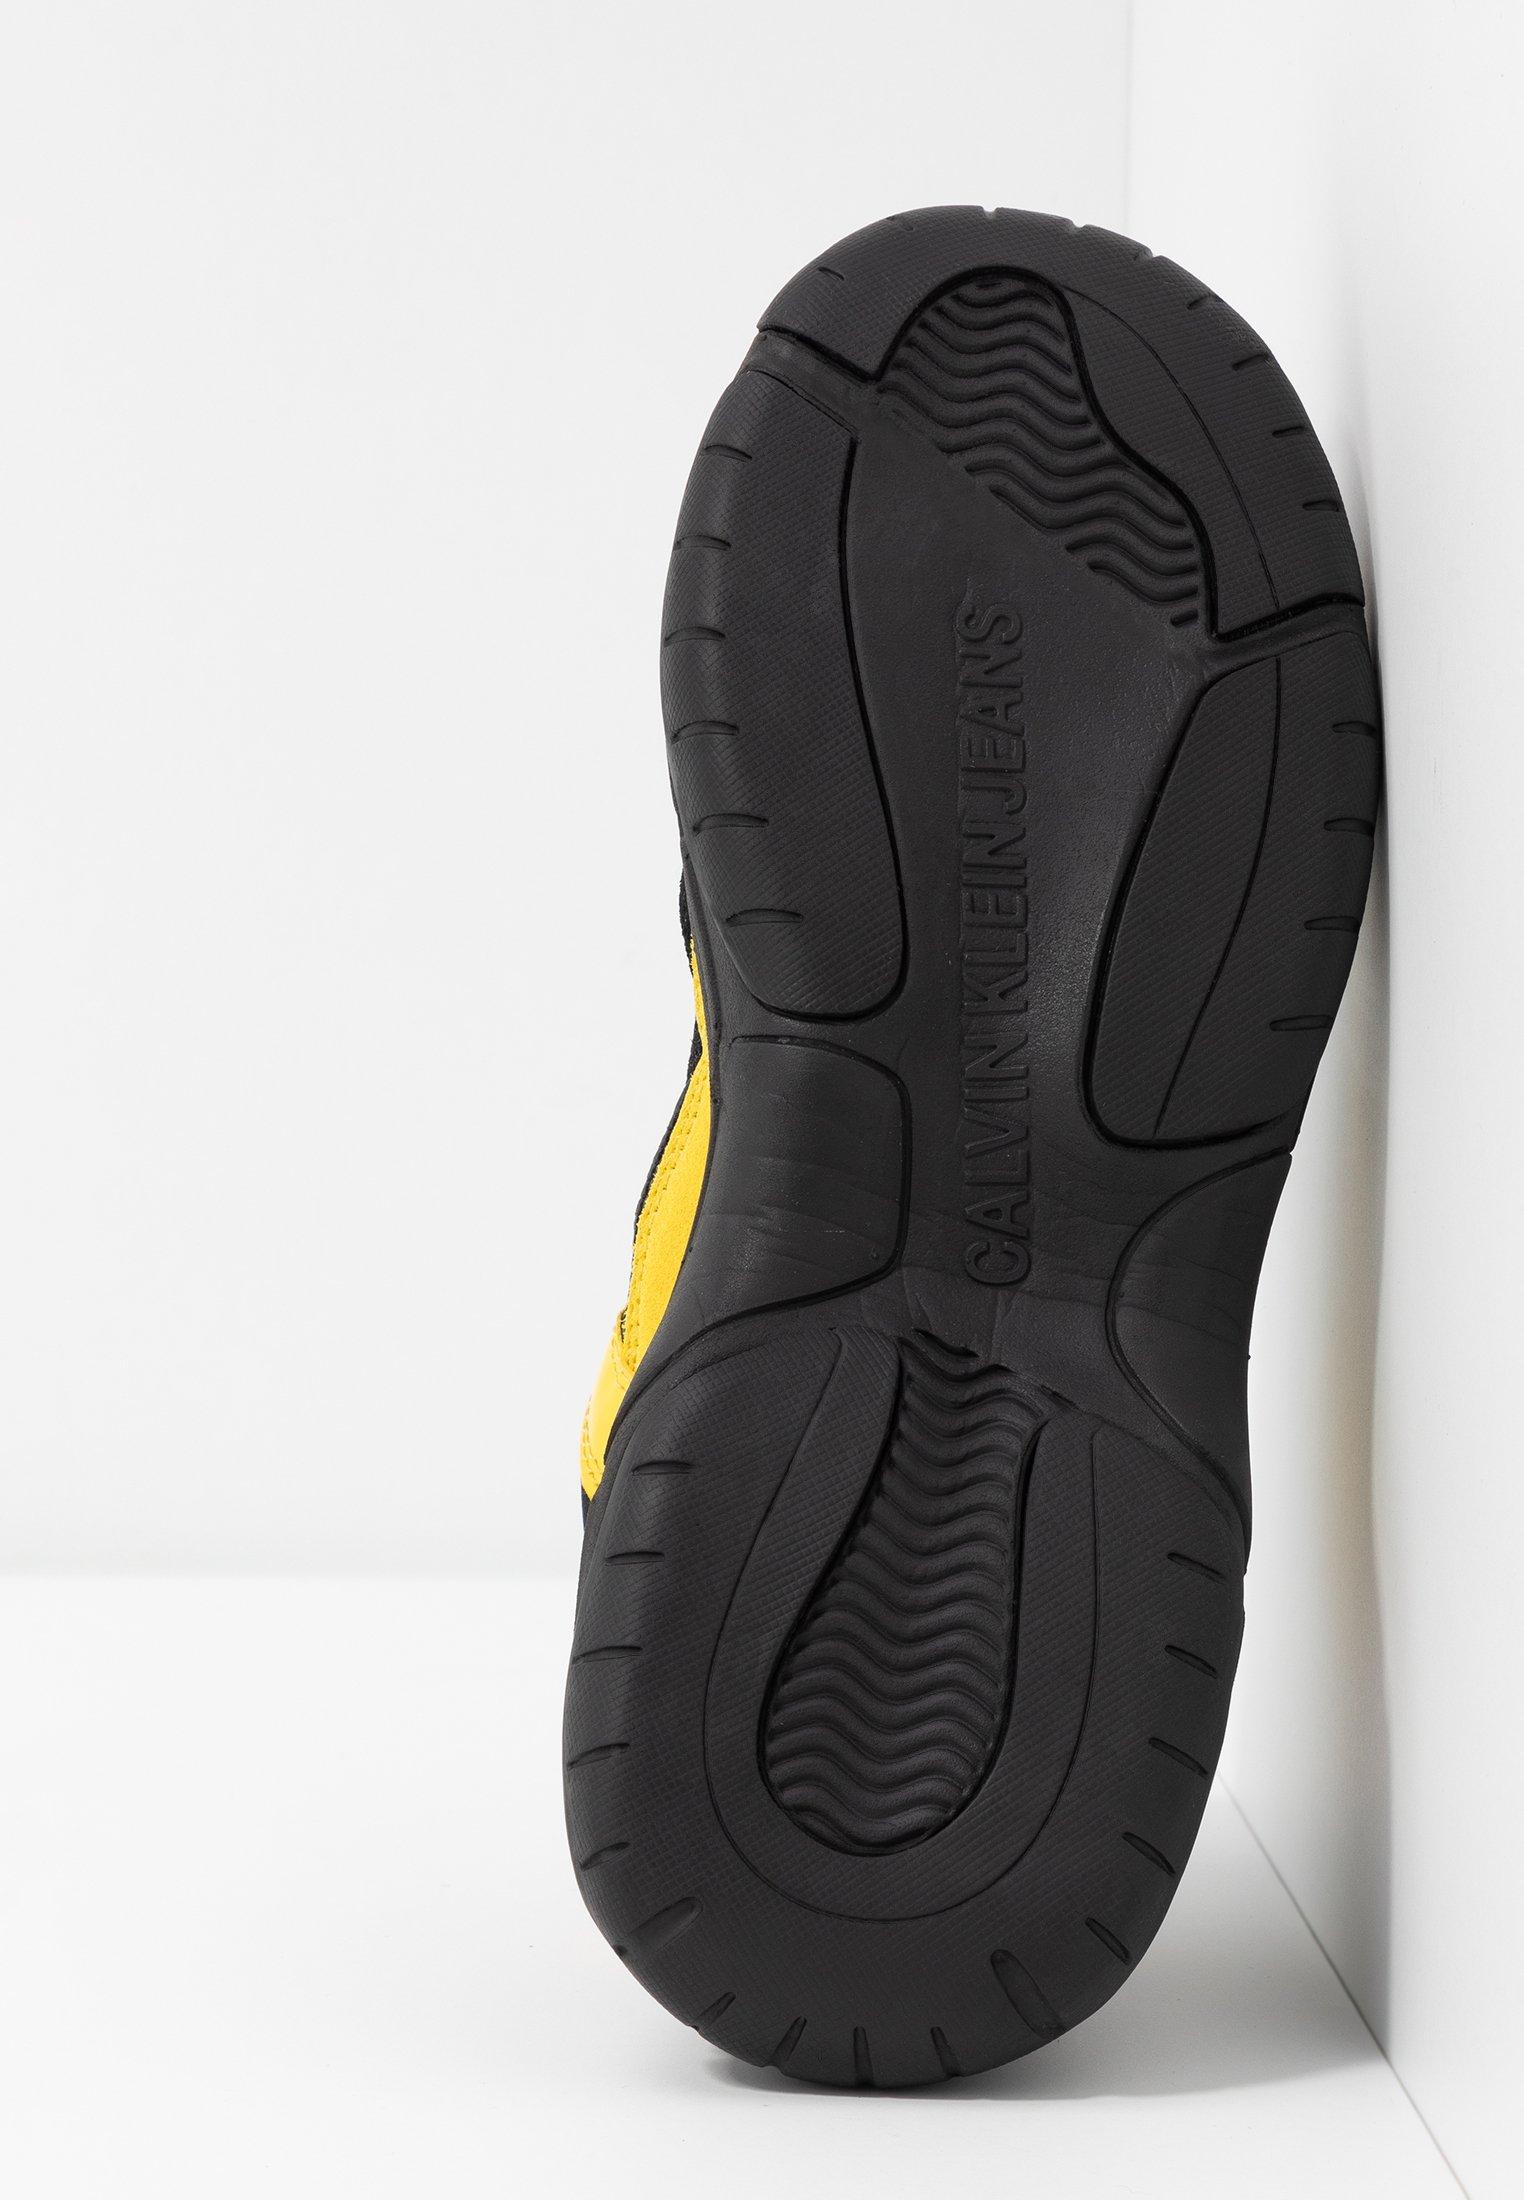 Sale 2020 Discount Women's Shoes Calvin Klein Jeans MAYA Trainers black/cyber yellow acI1kHEeY eMWlwqvw7